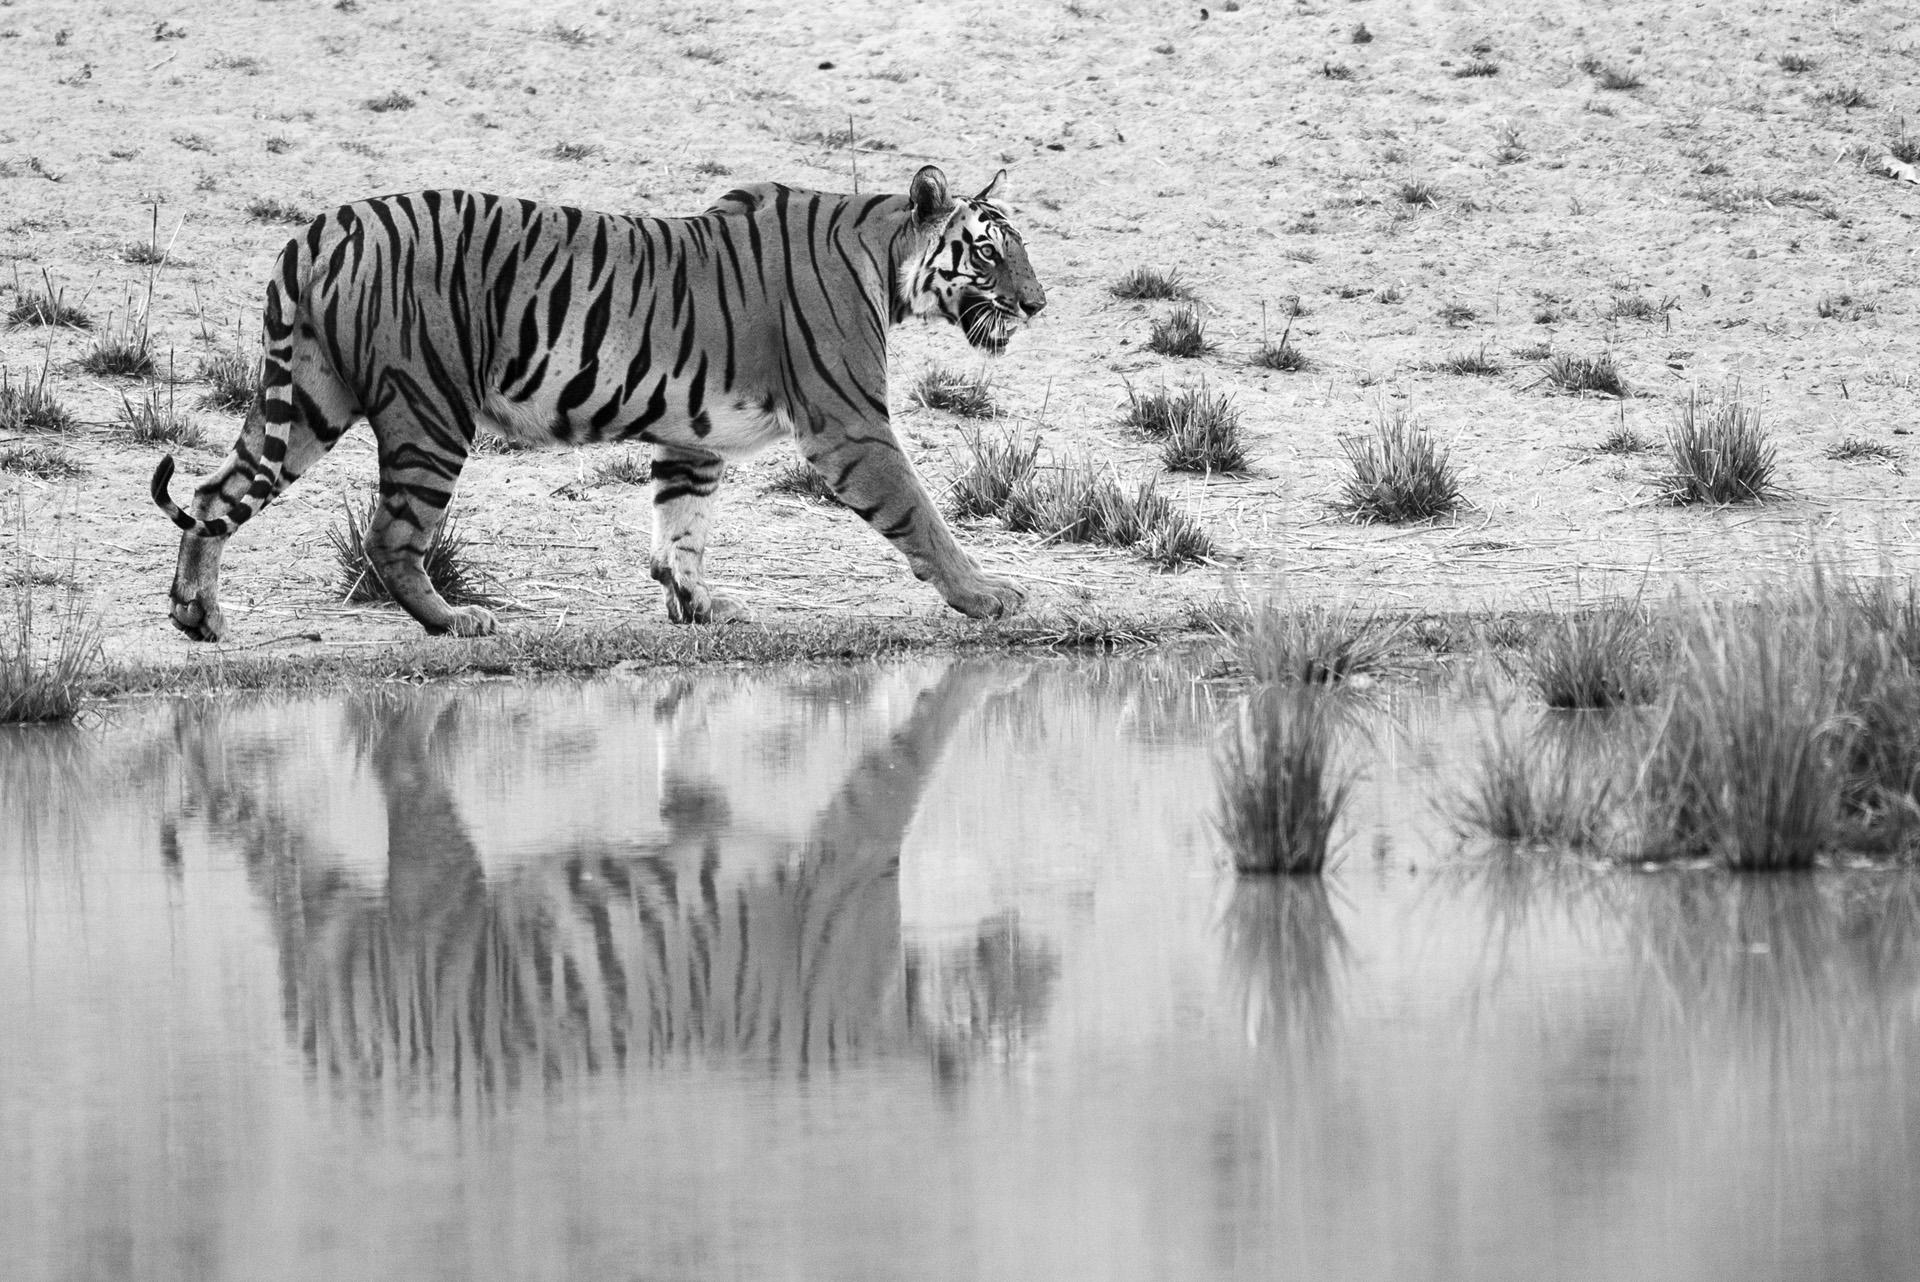 Bengal tigress walking along edge of pool, Bandhavgarh National Park, Madhya Pradesh, India